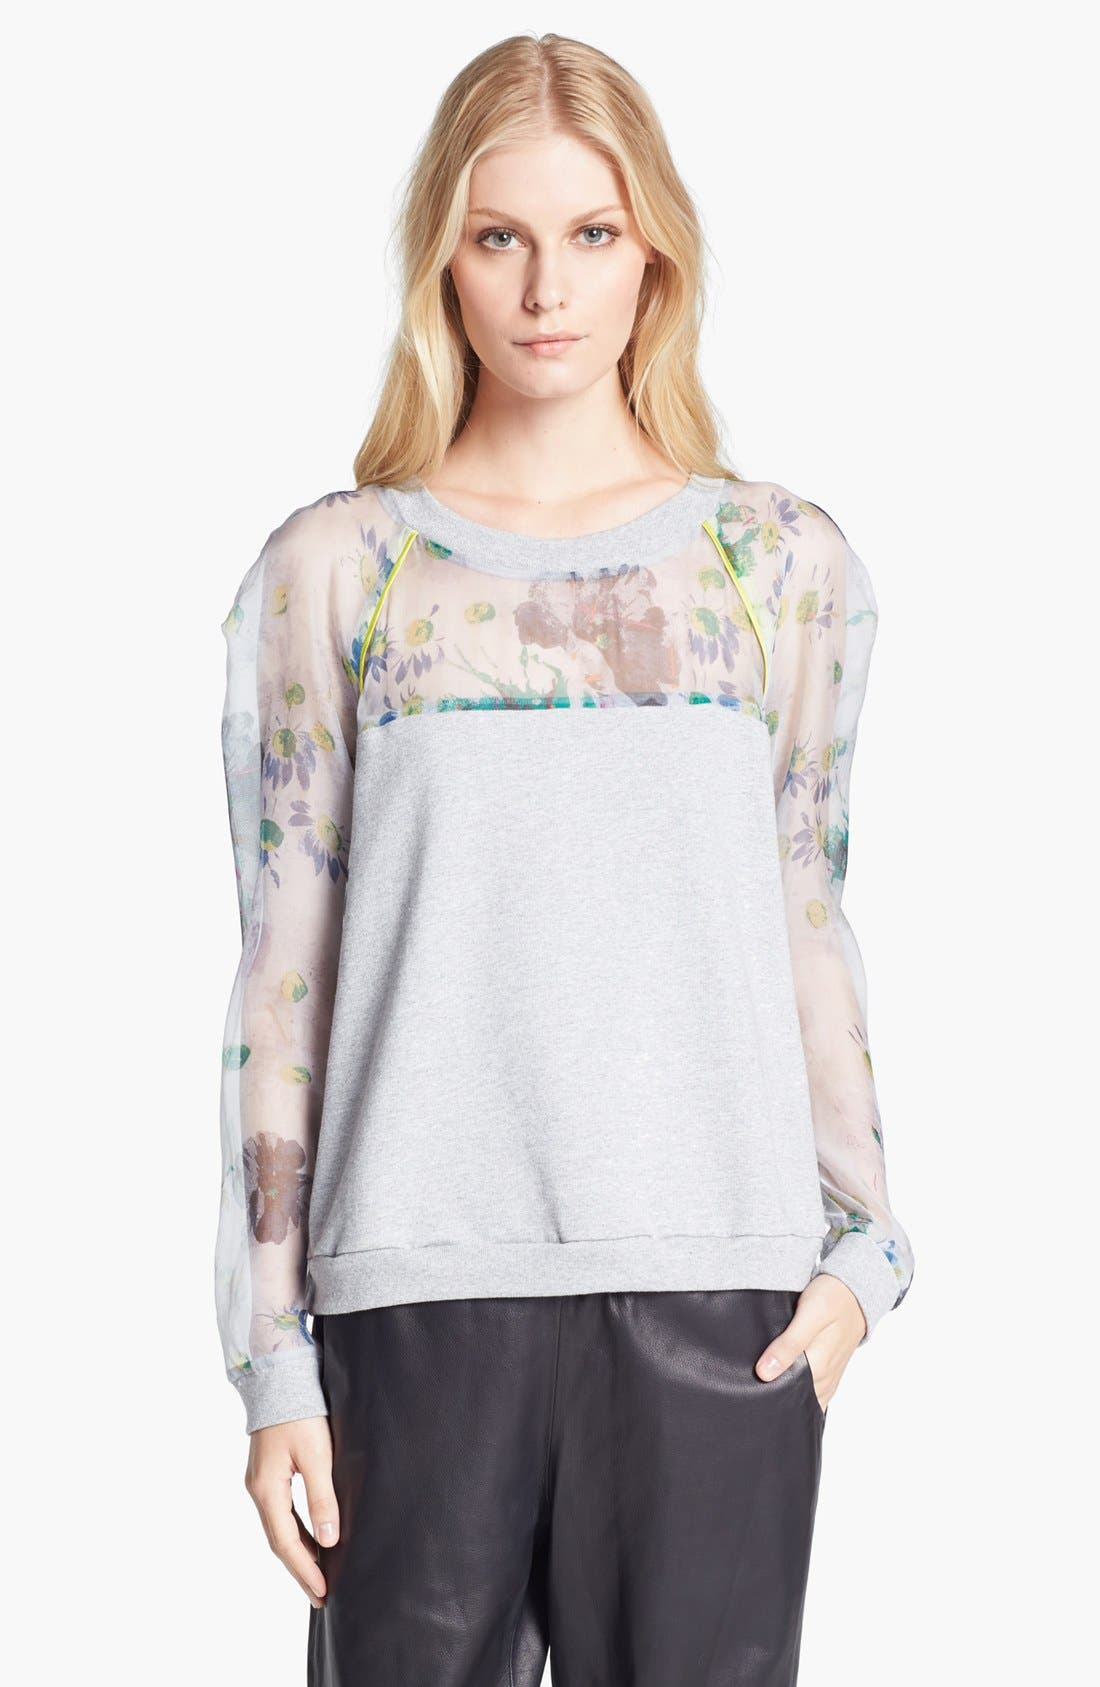 Main Image - Elizabeth and James 'Frankie' Sweatshirt